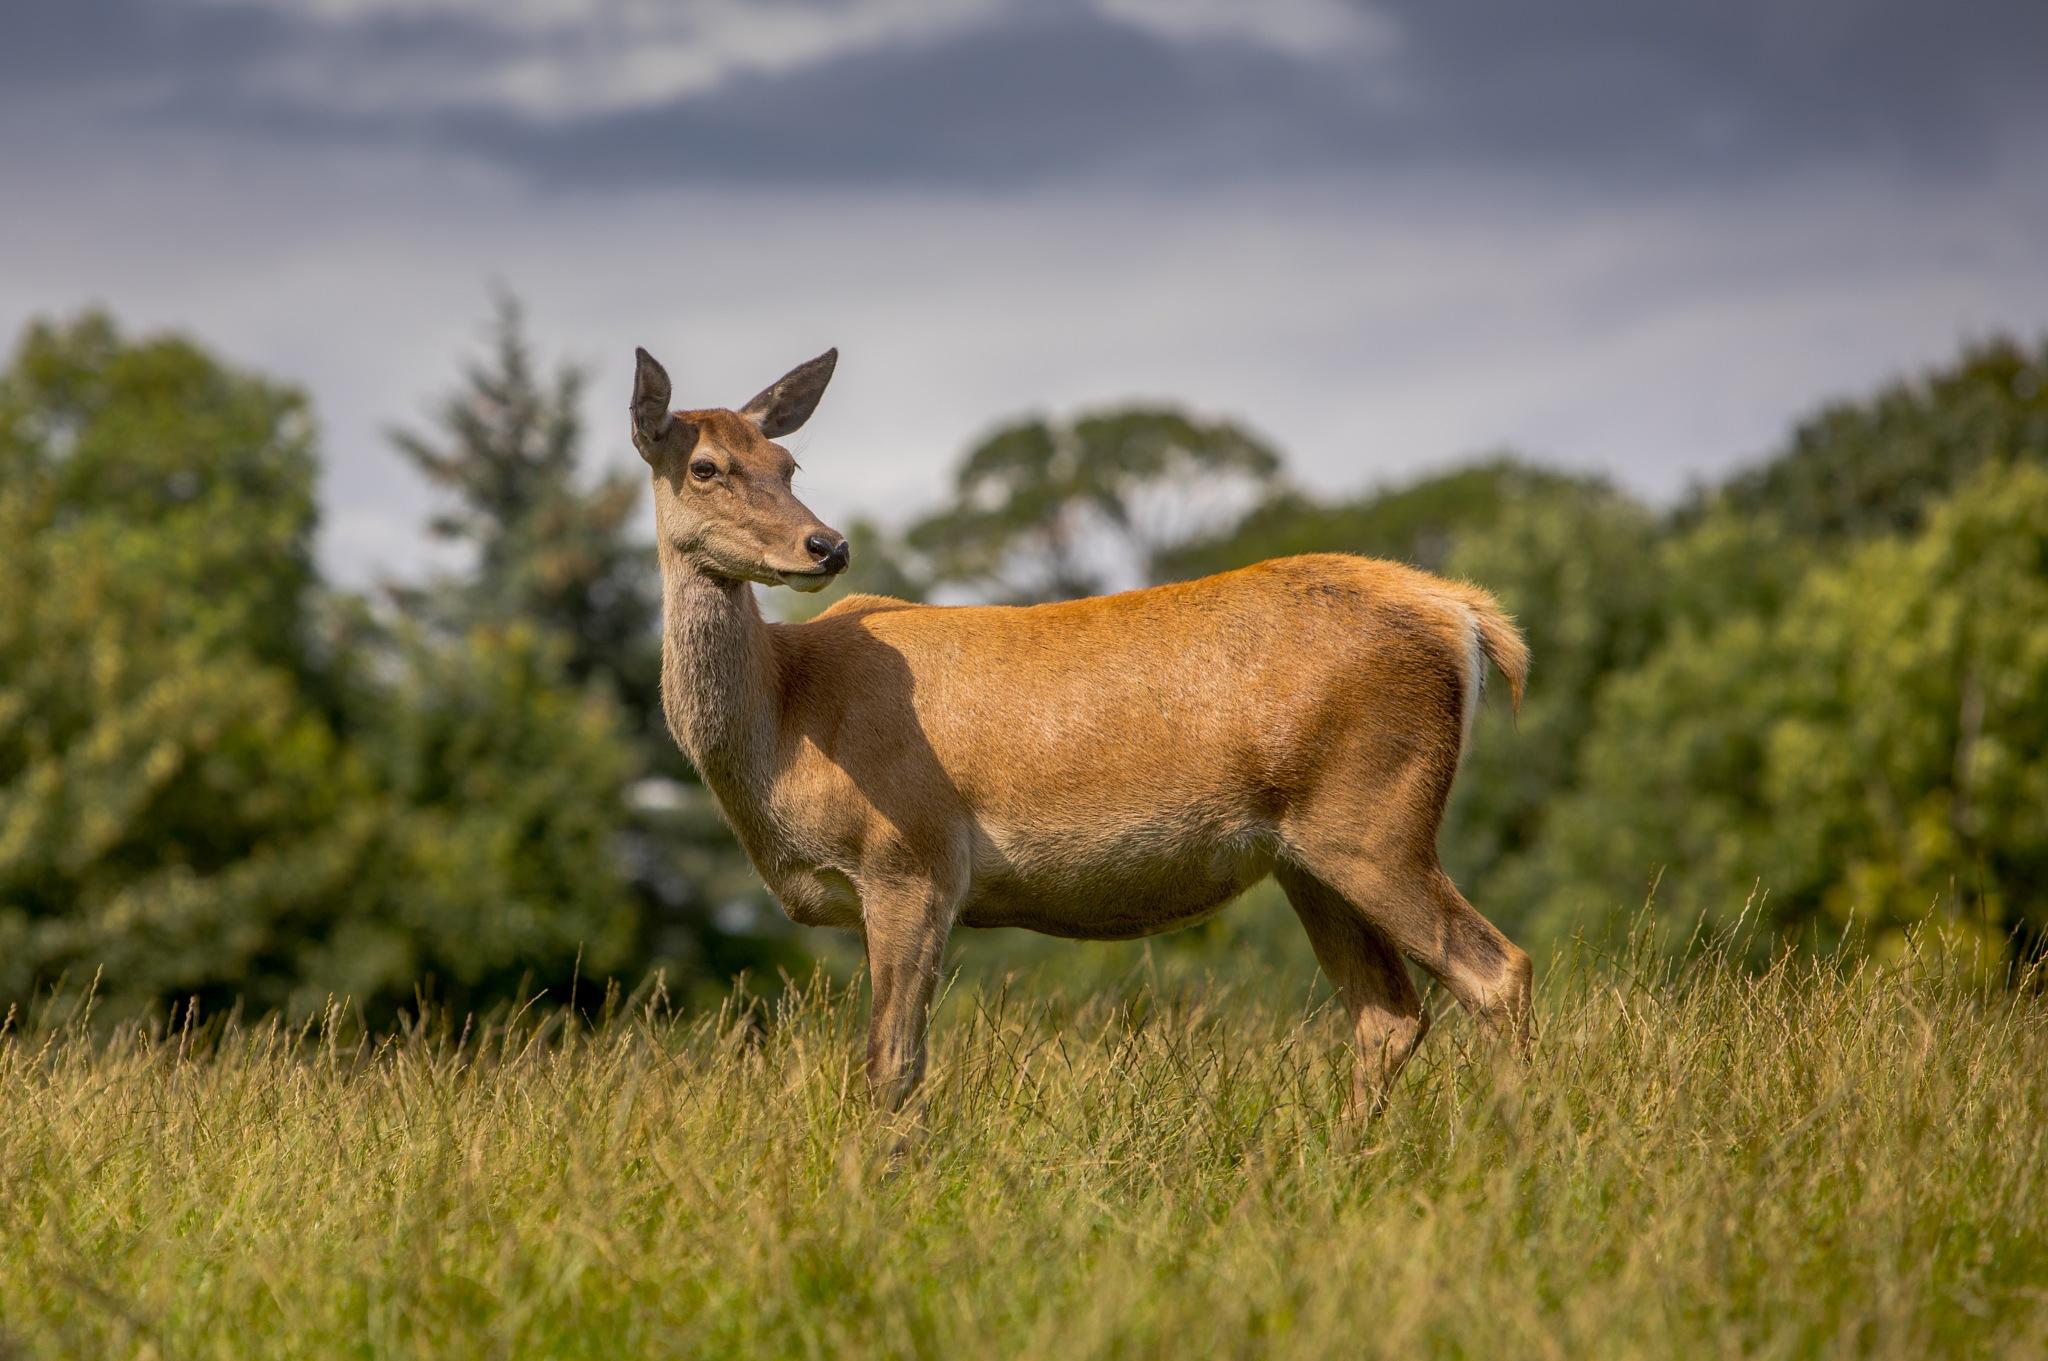 Rd Deer 2 by bannekh